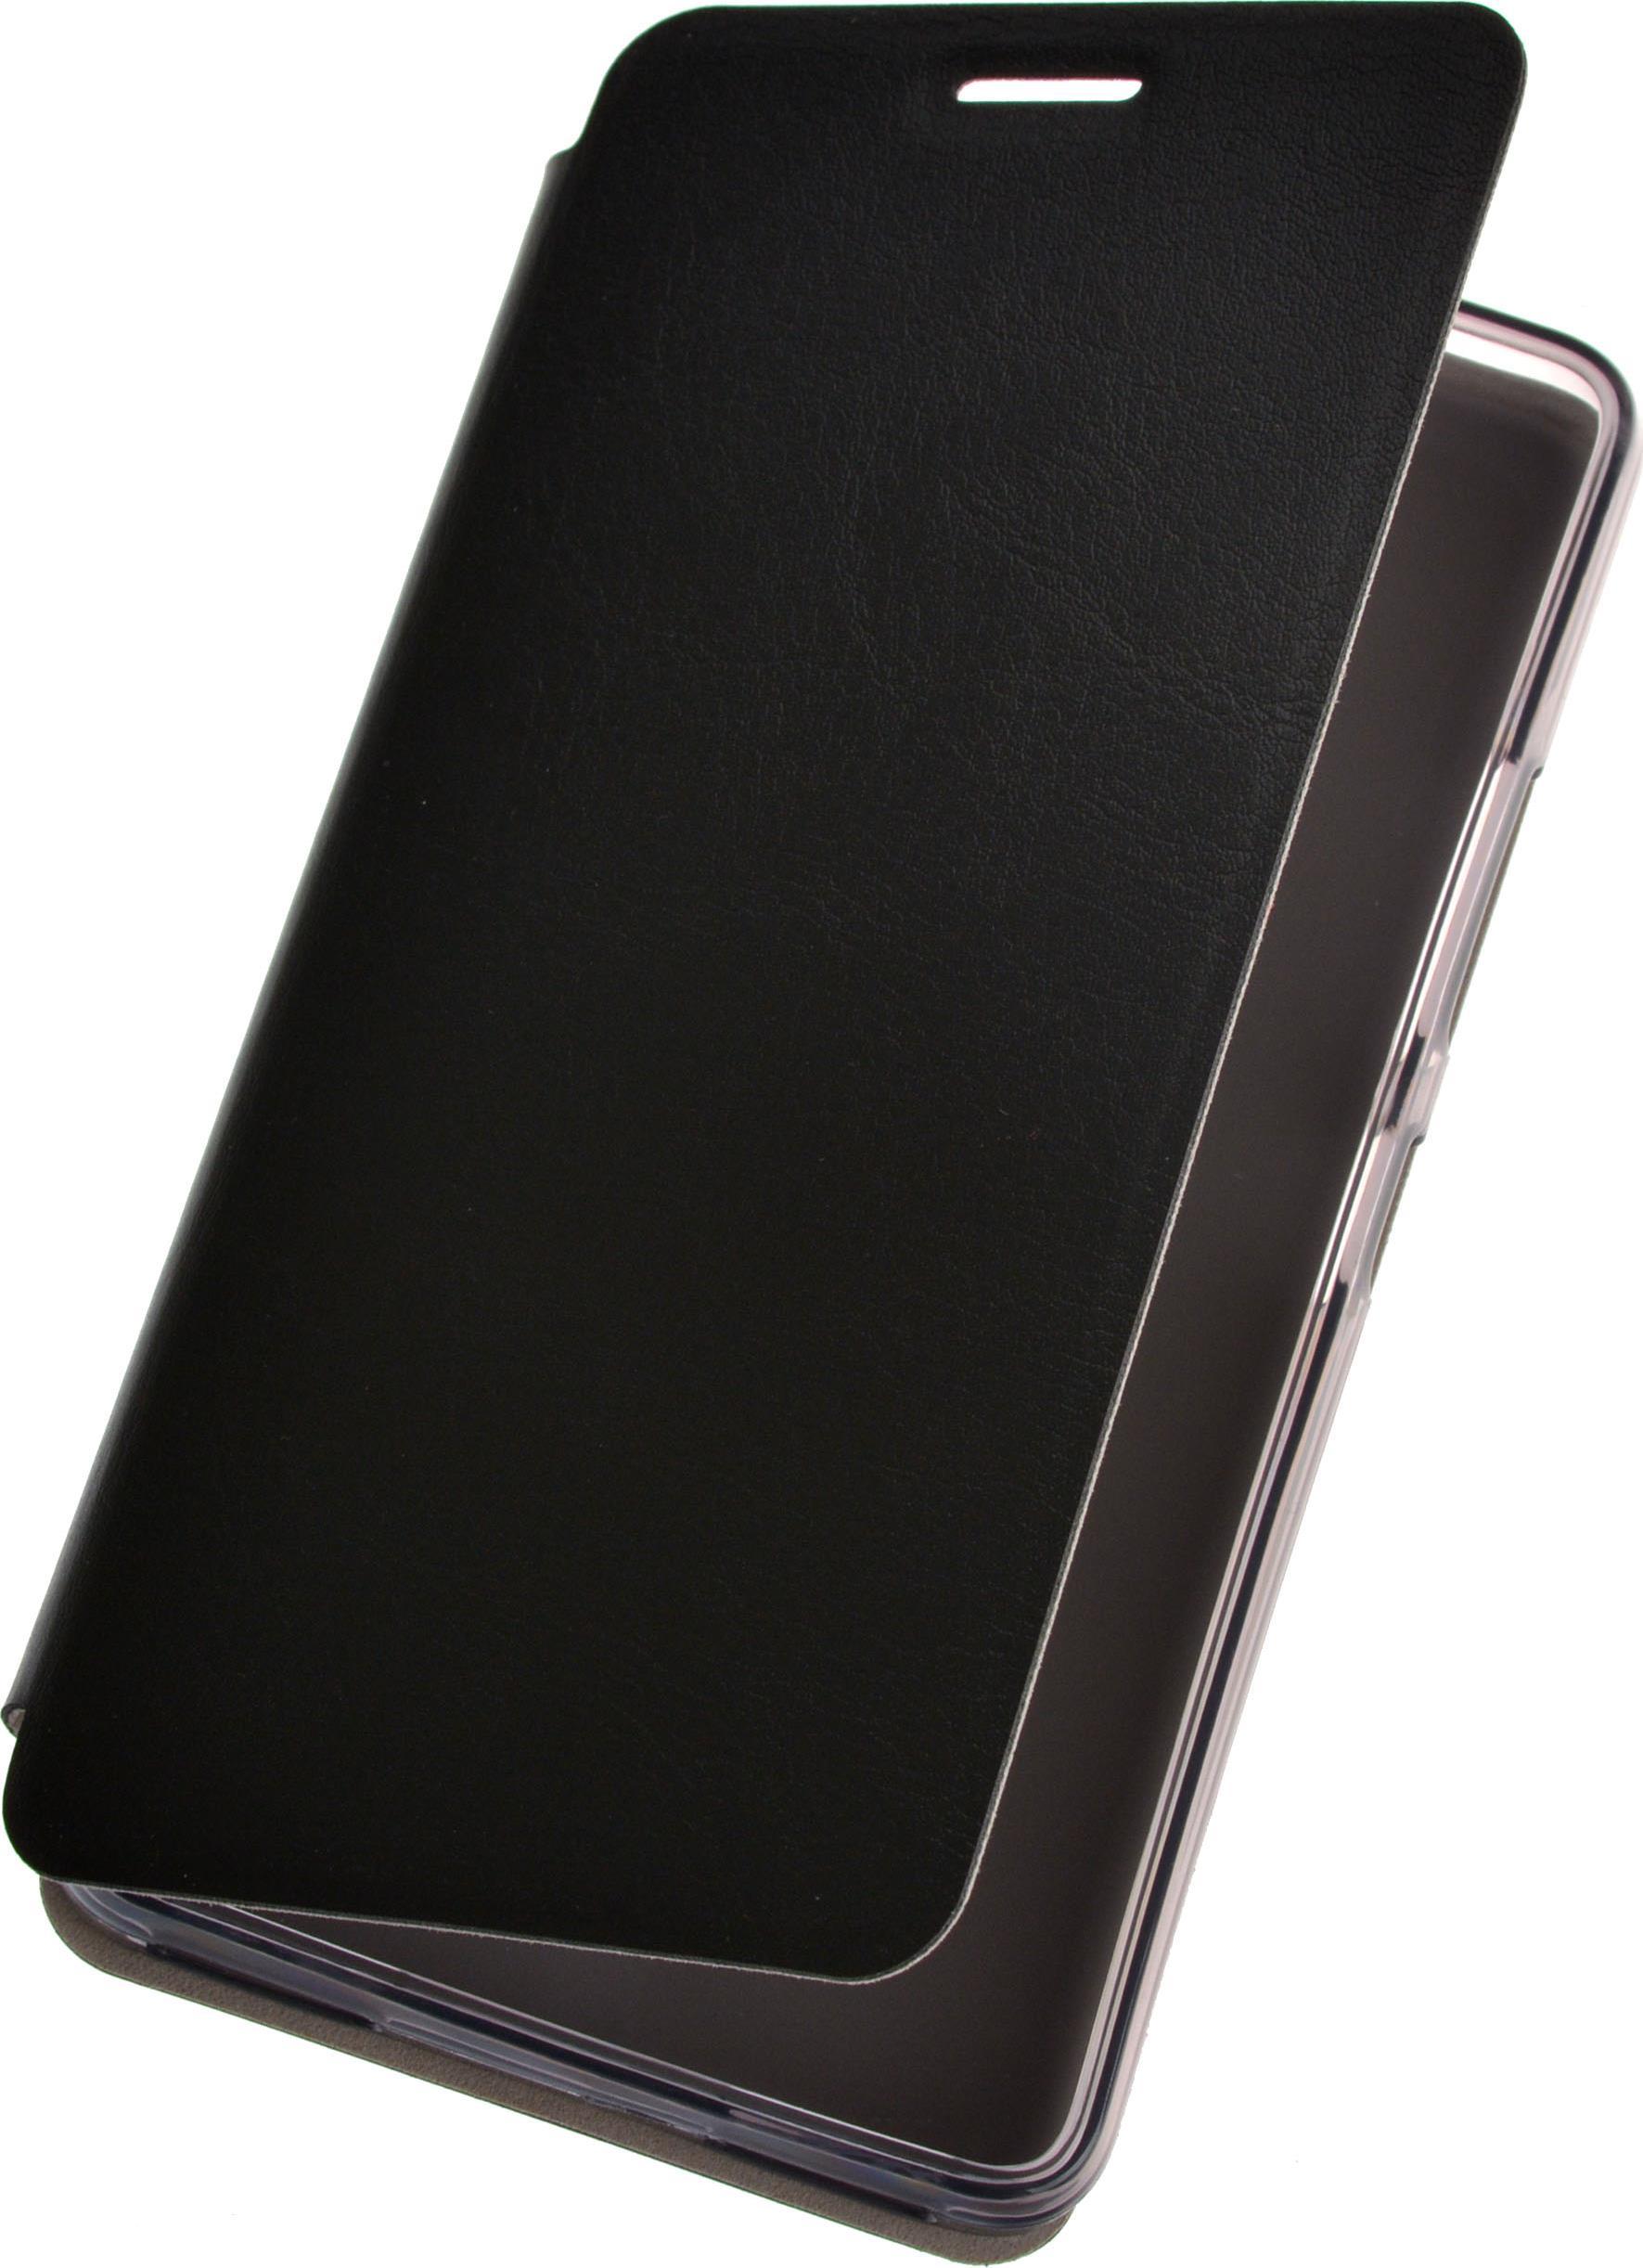 Чехол Skinbox Lux для Lenovo Vibe P1 mini P1MA40, черный